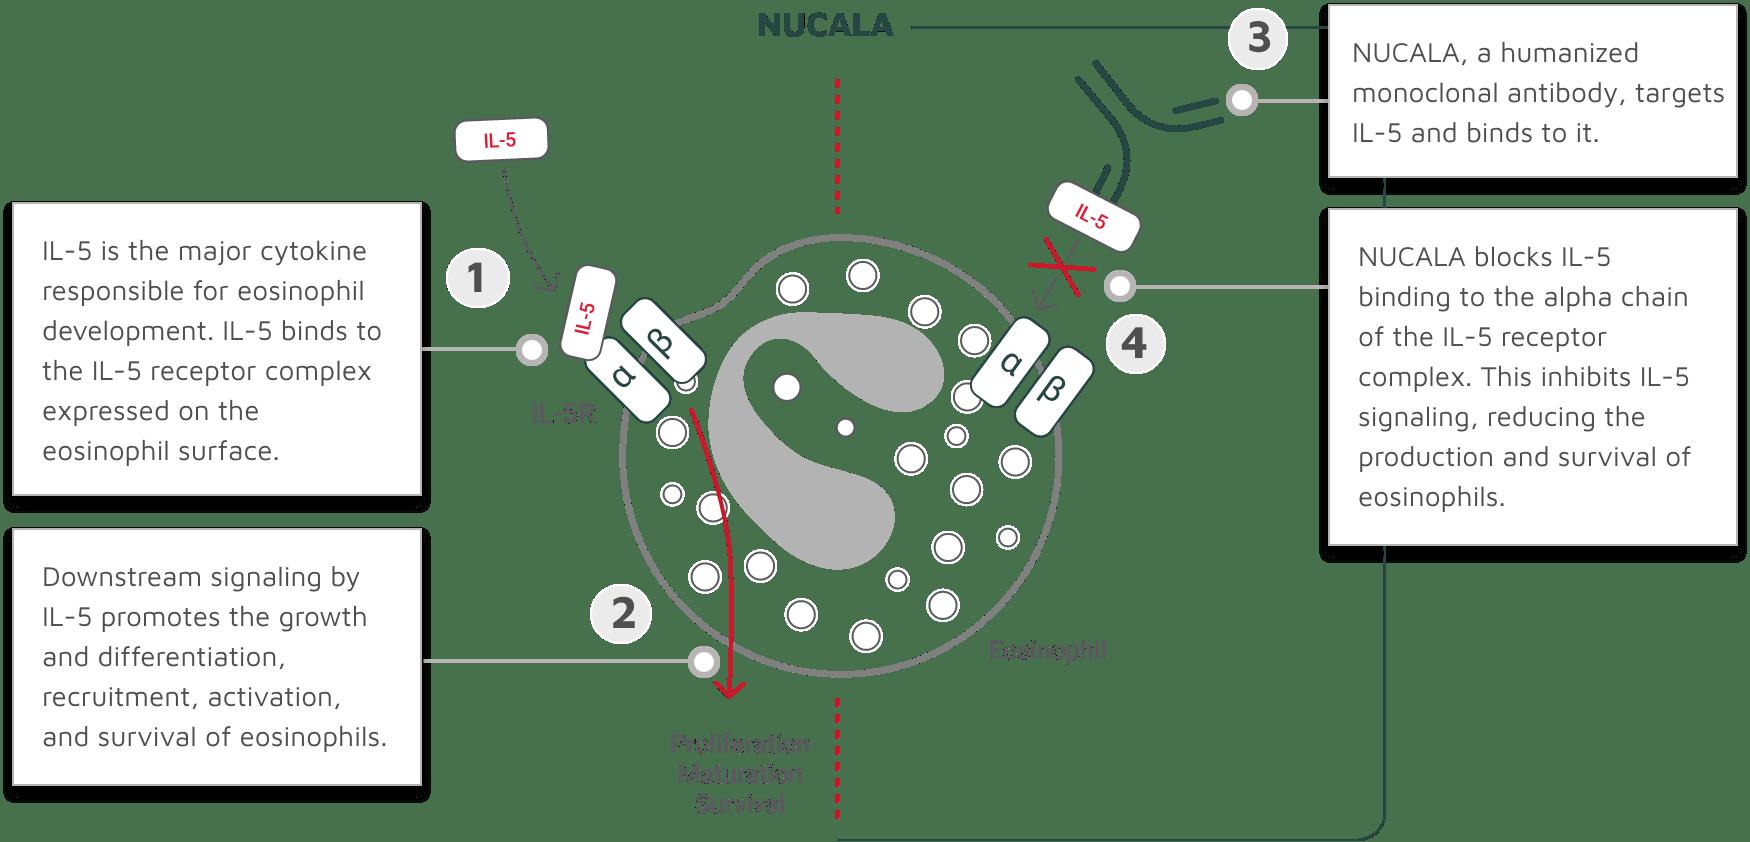 NUCALA MOA diagram